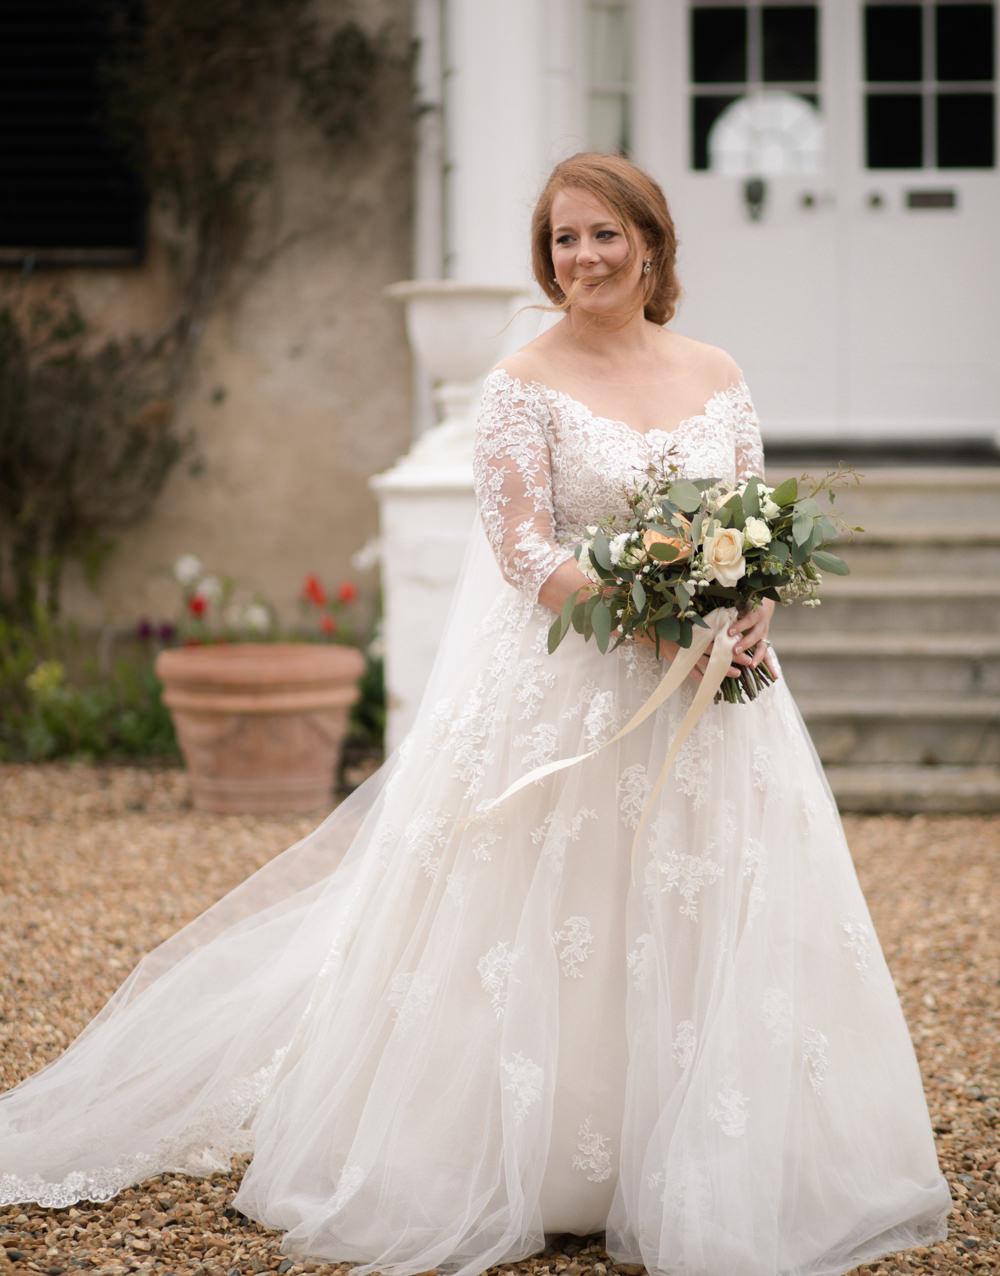 Bride Bridal Lace Bardot Button Back A Line Dress Gown Long Up Do Watercolour Wedding Kerry Ann Duffy Photography